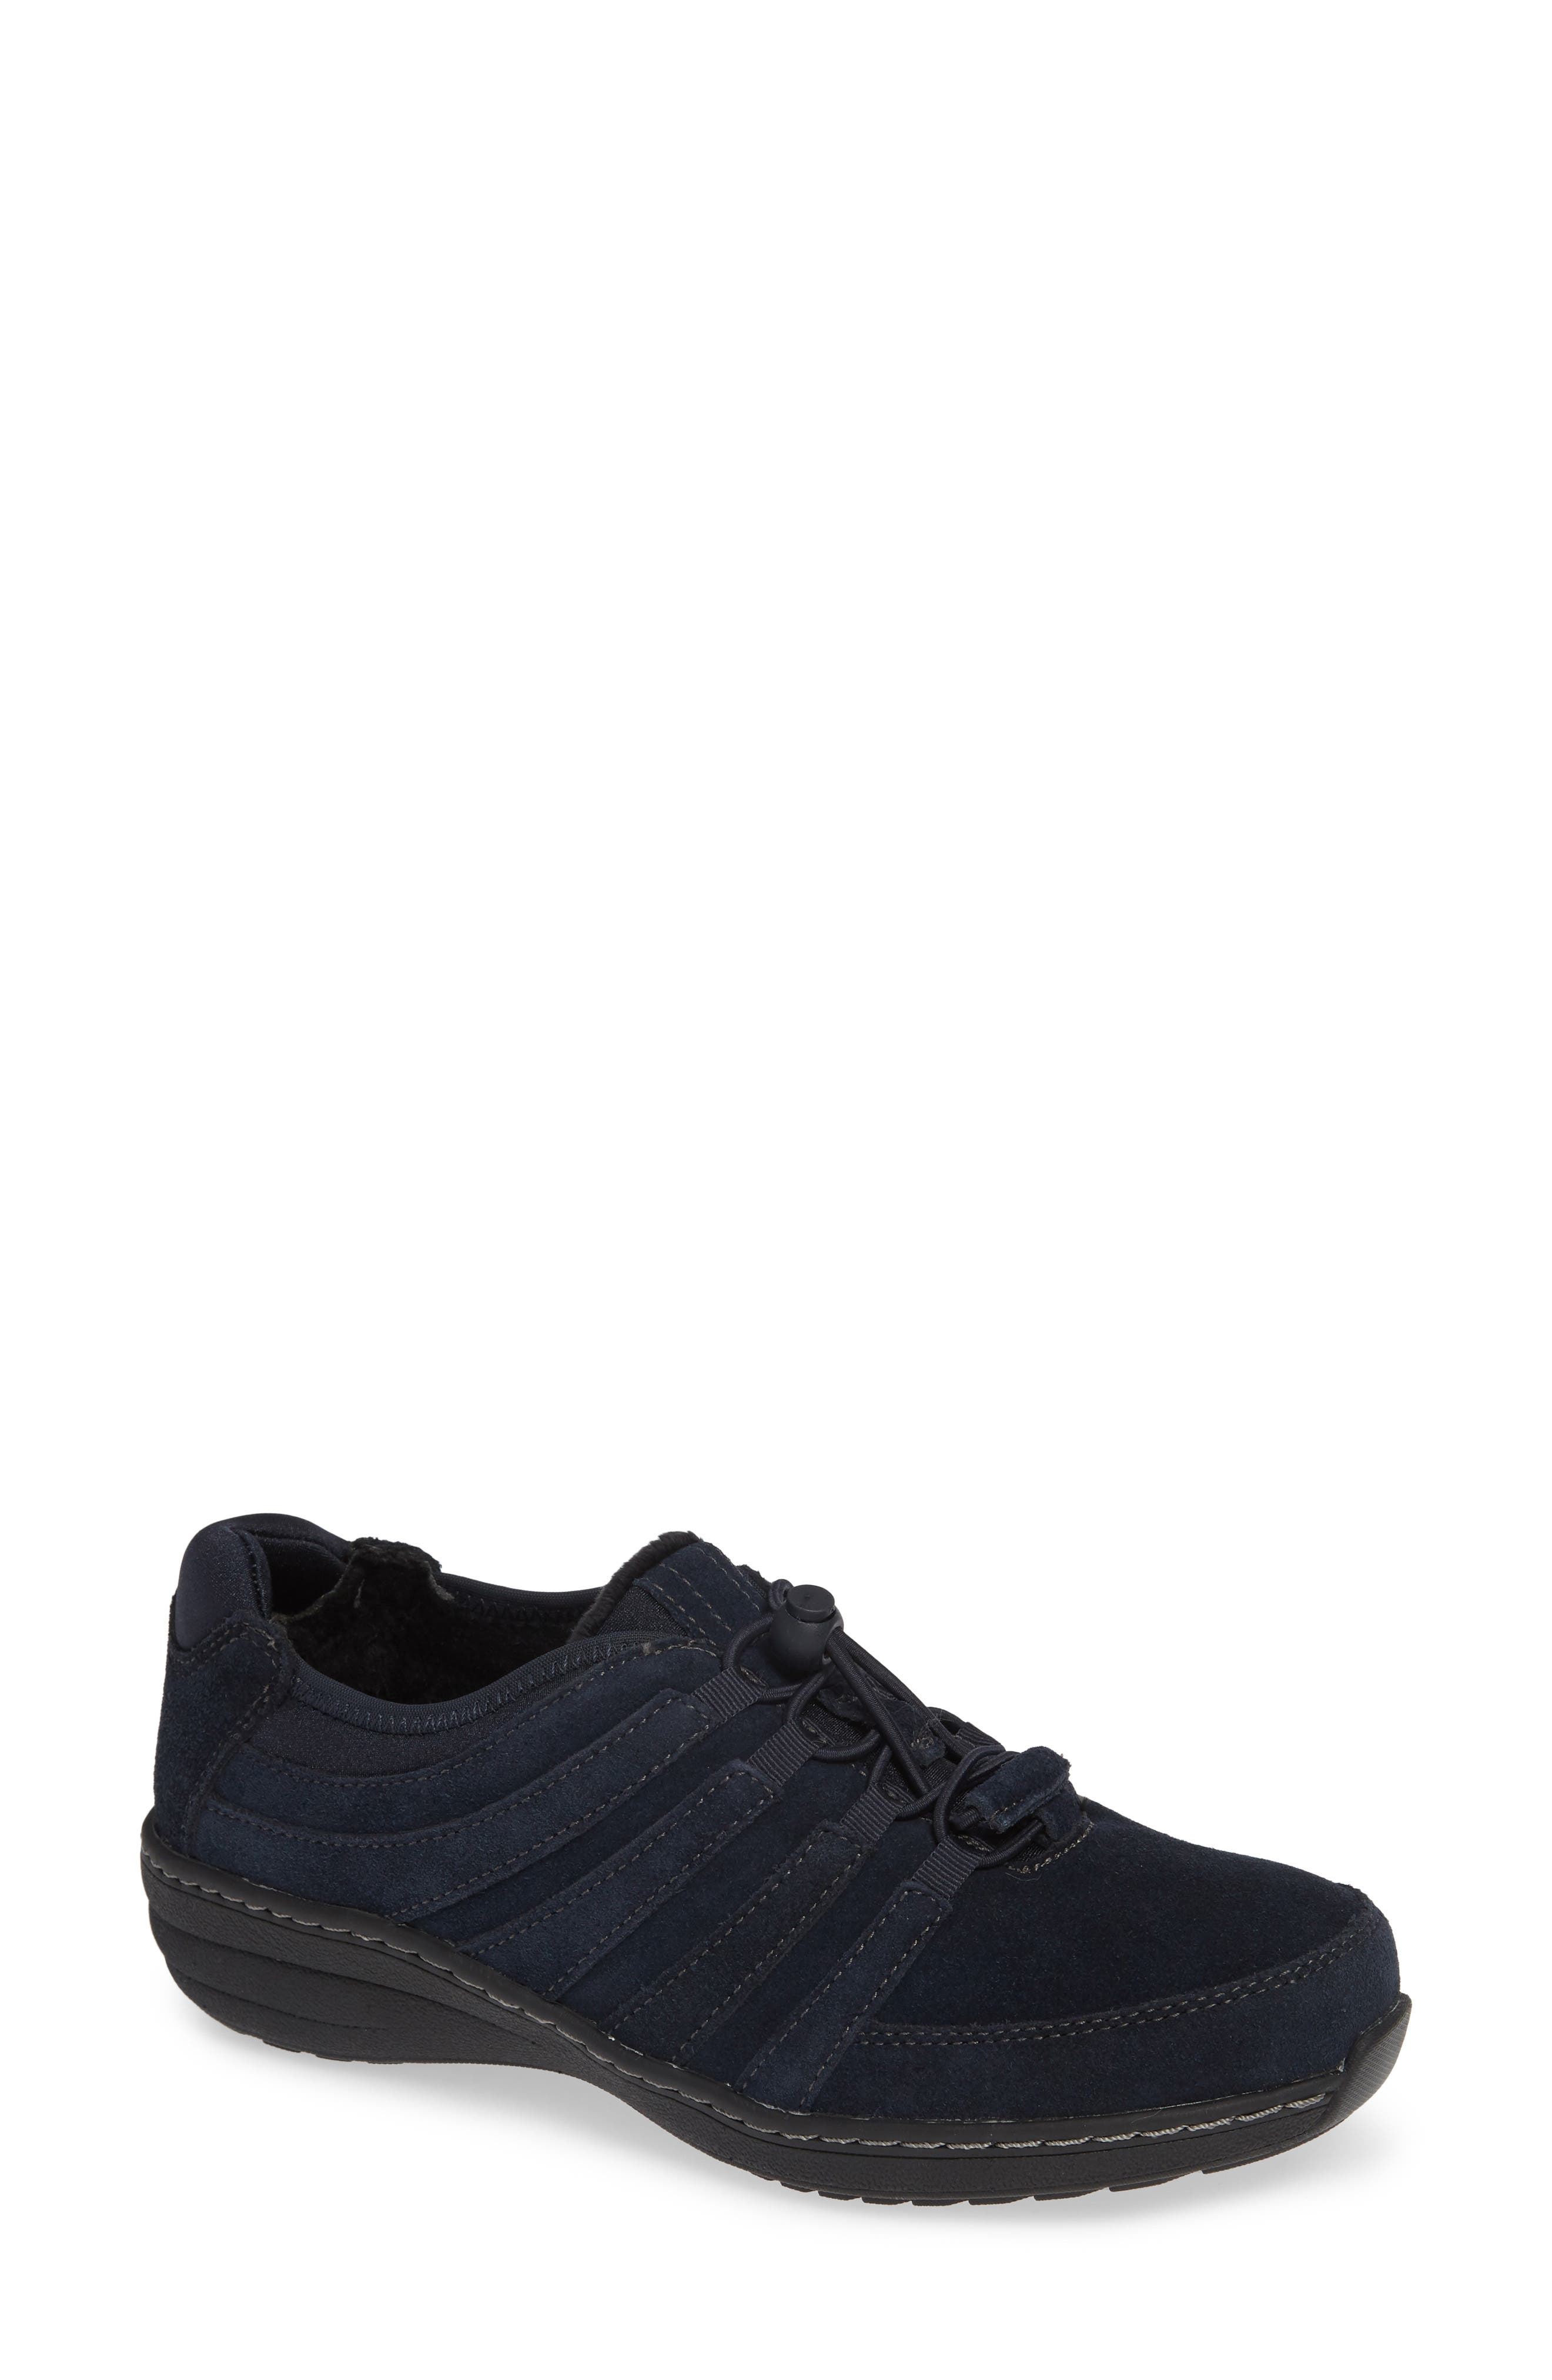 Aetrex Laney Sneaker, Blue